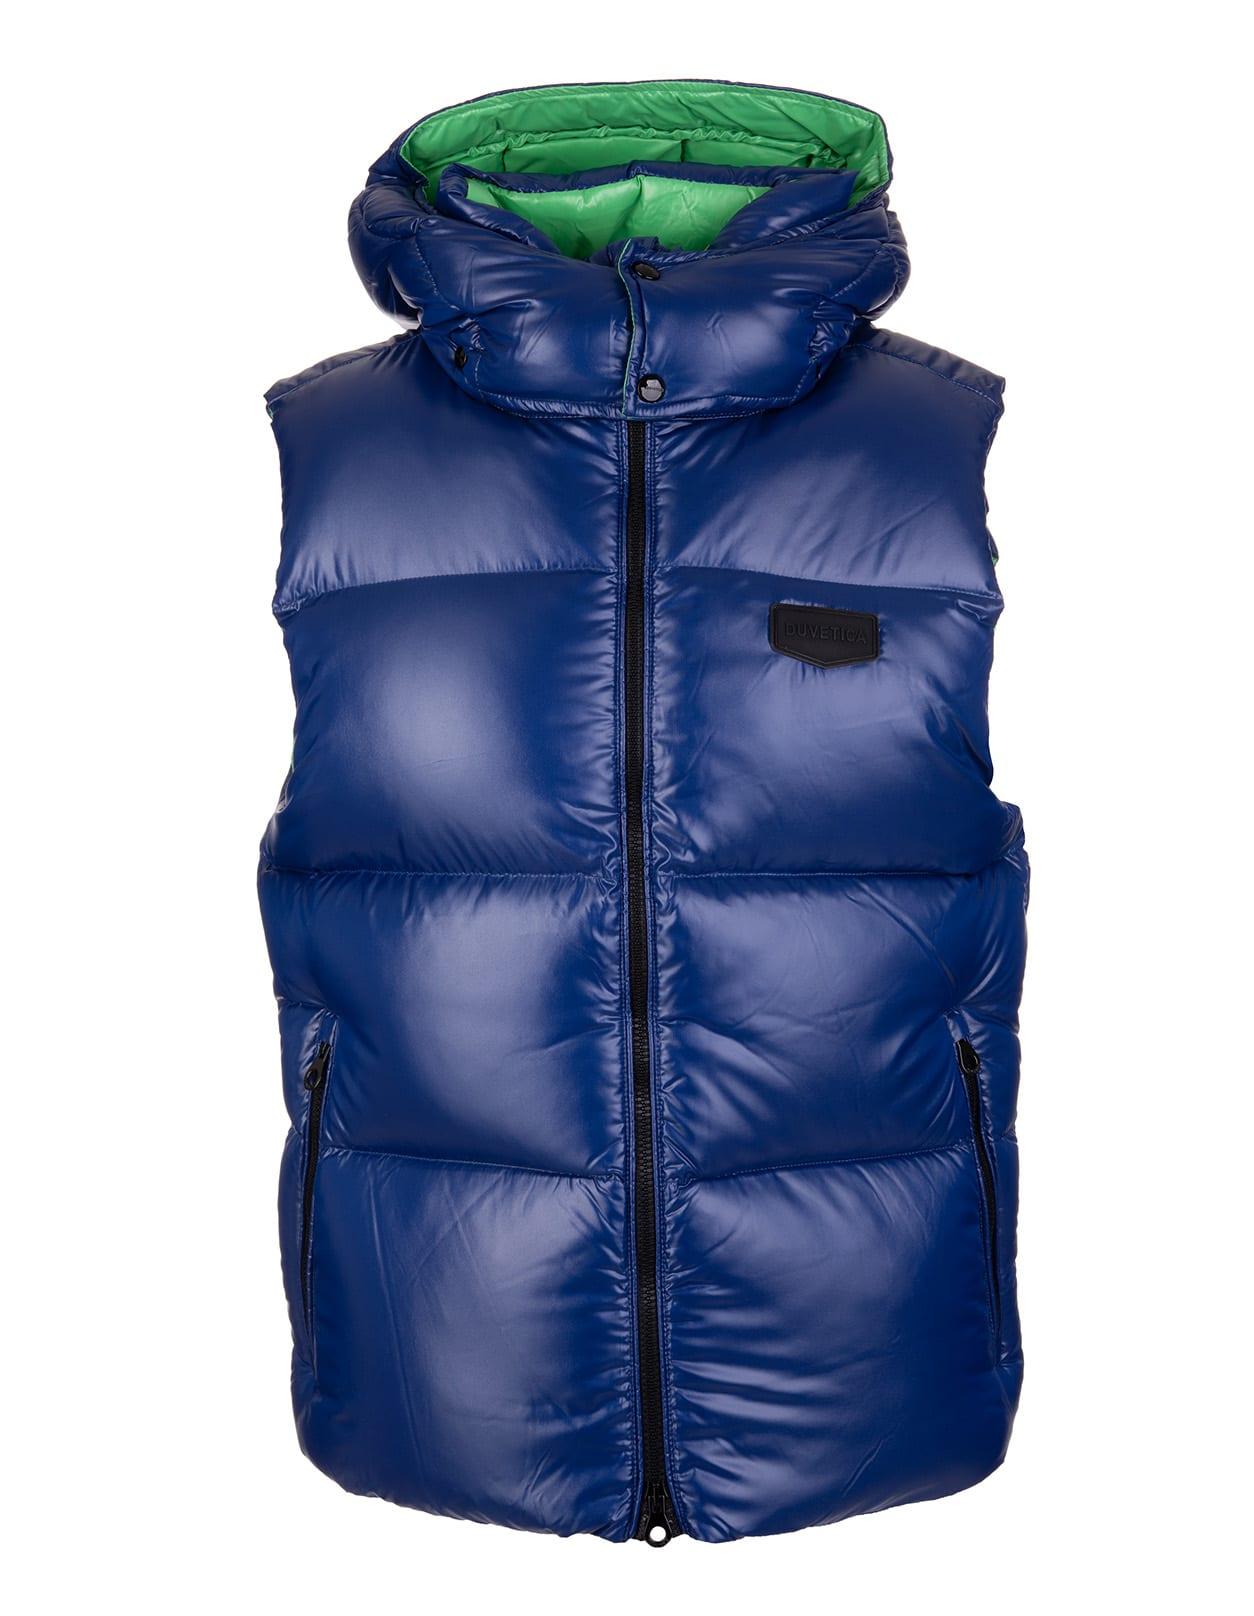 Man Sapphire Blue Salino Sleeveless Jacket